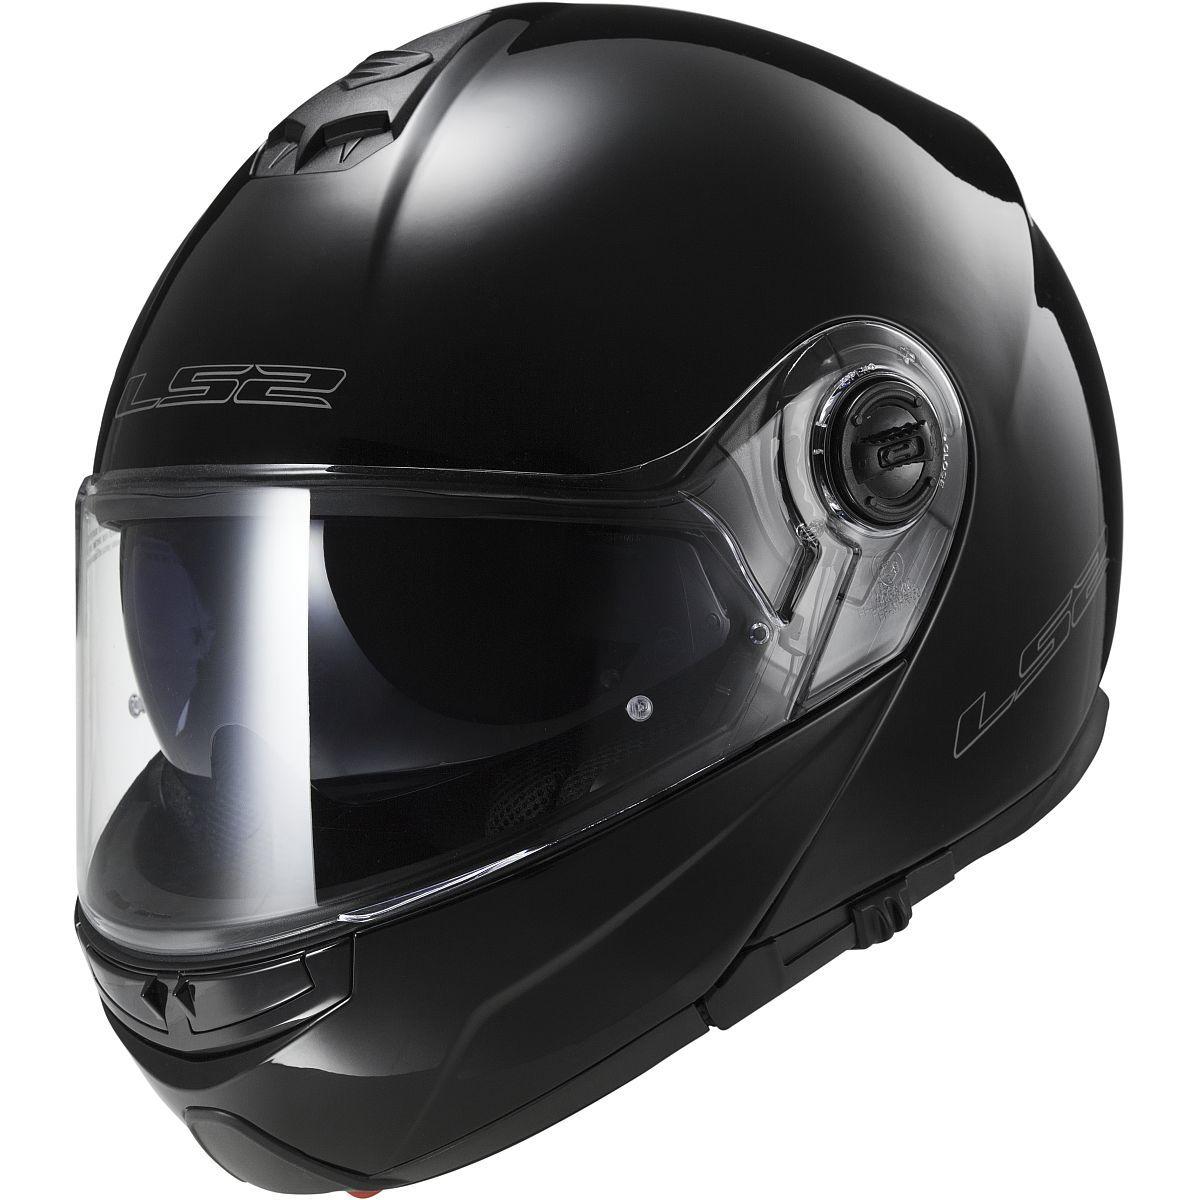 LS2 Strobe Solid Modular Motorcycle Helmet